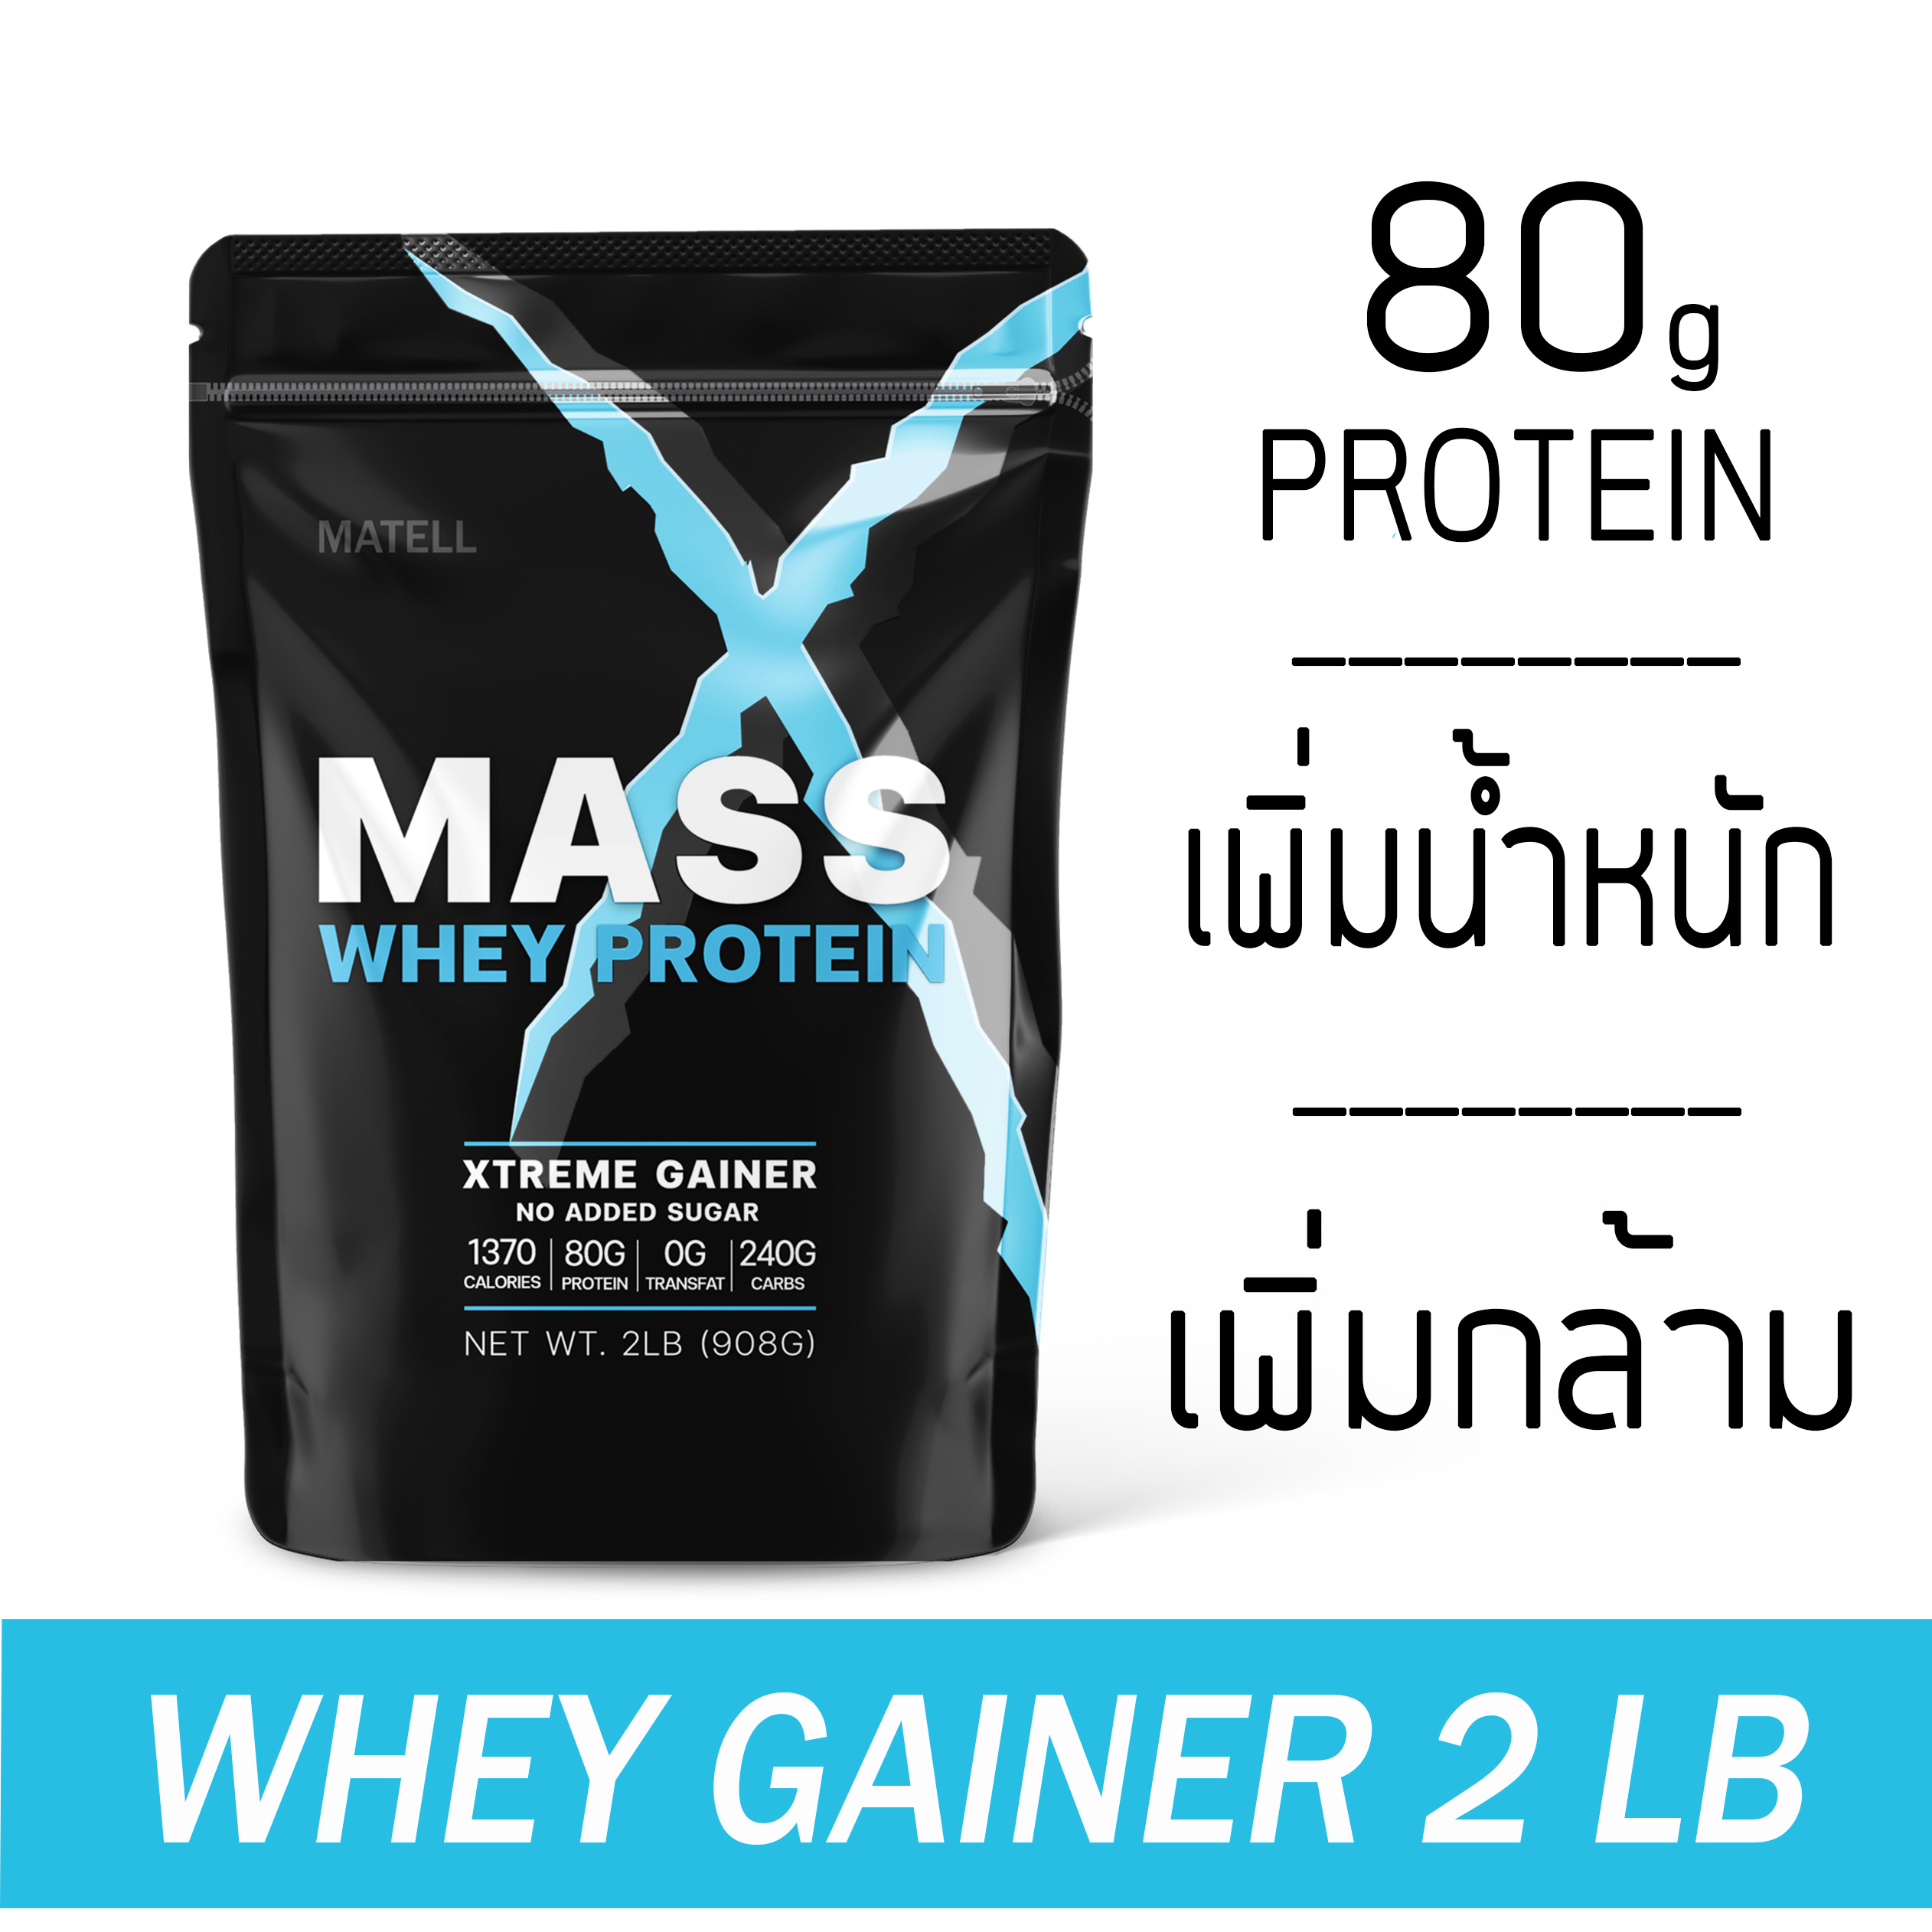 Matell Mass Whey Protein Gainer 2 Lb แมส เวย์ โปรตีน 2ปอนด์ หรือ 908กรัม (non Soyซอย) เพิ่มน้ำหนัก + เพิ่มกล้ามเนื้อ.